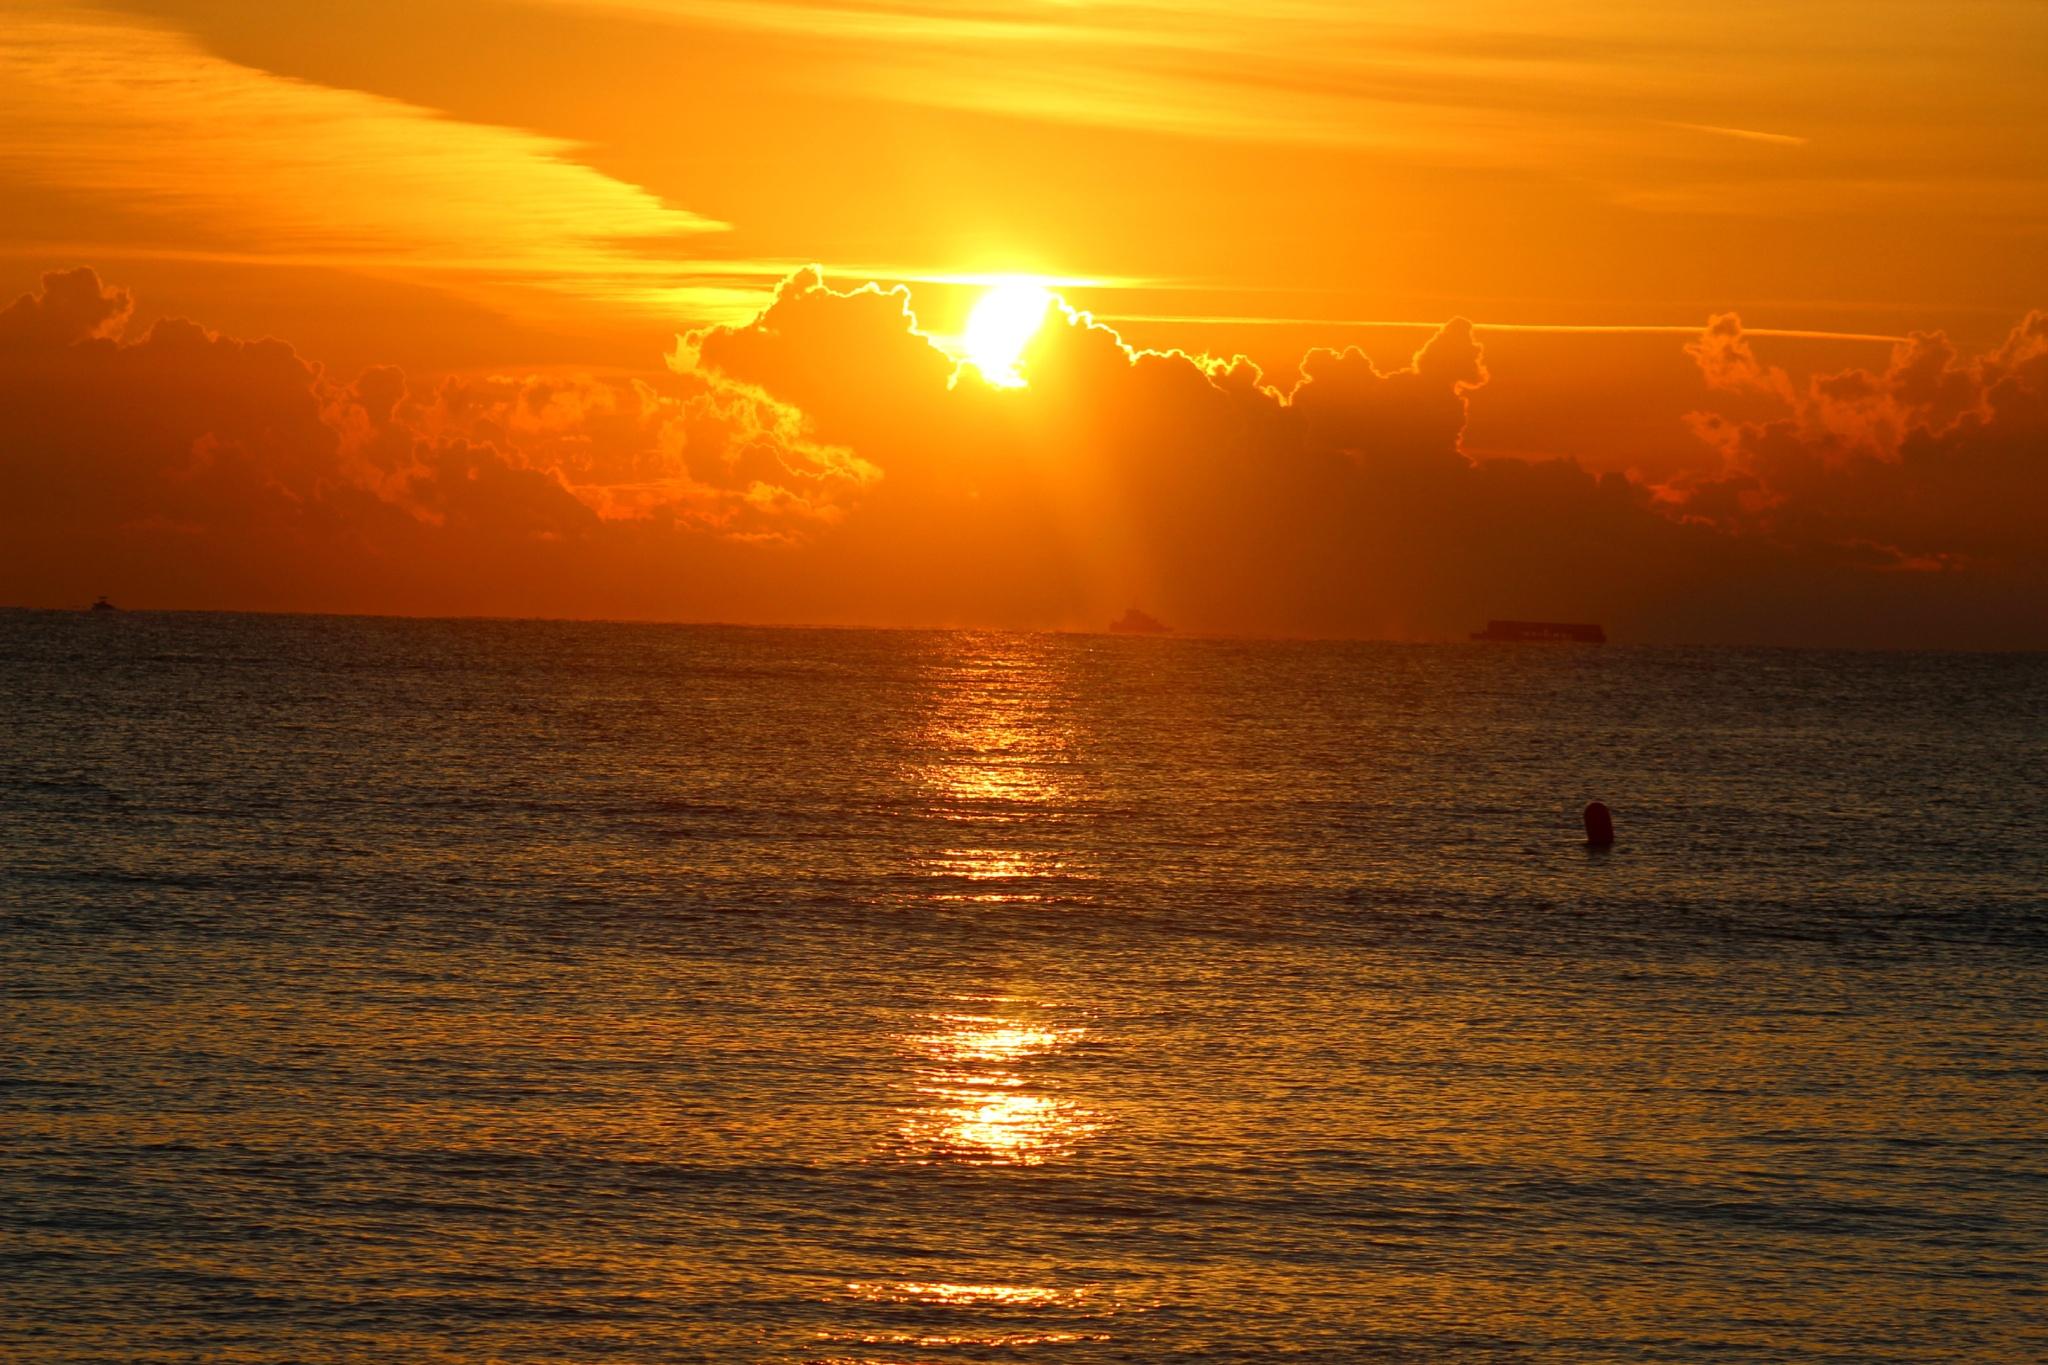 Sunrise at the beach by michael.grogan.969